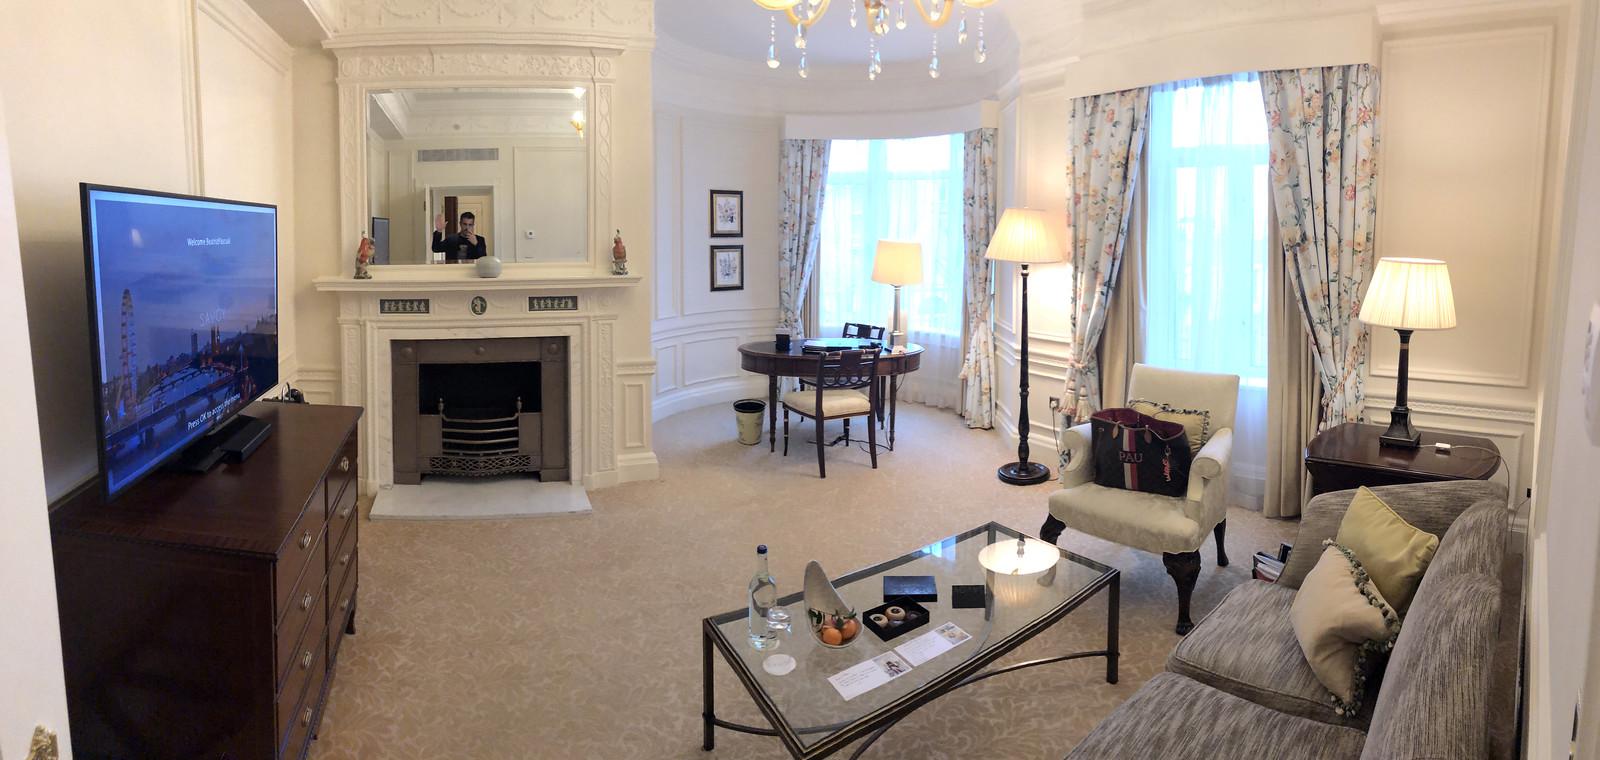 Hotel Savoy de Londres - The Savoy London - Thewotme hotel savoy de londres - 50940489726 79db831a99 h - El histórico Hotel Savoy de Londres